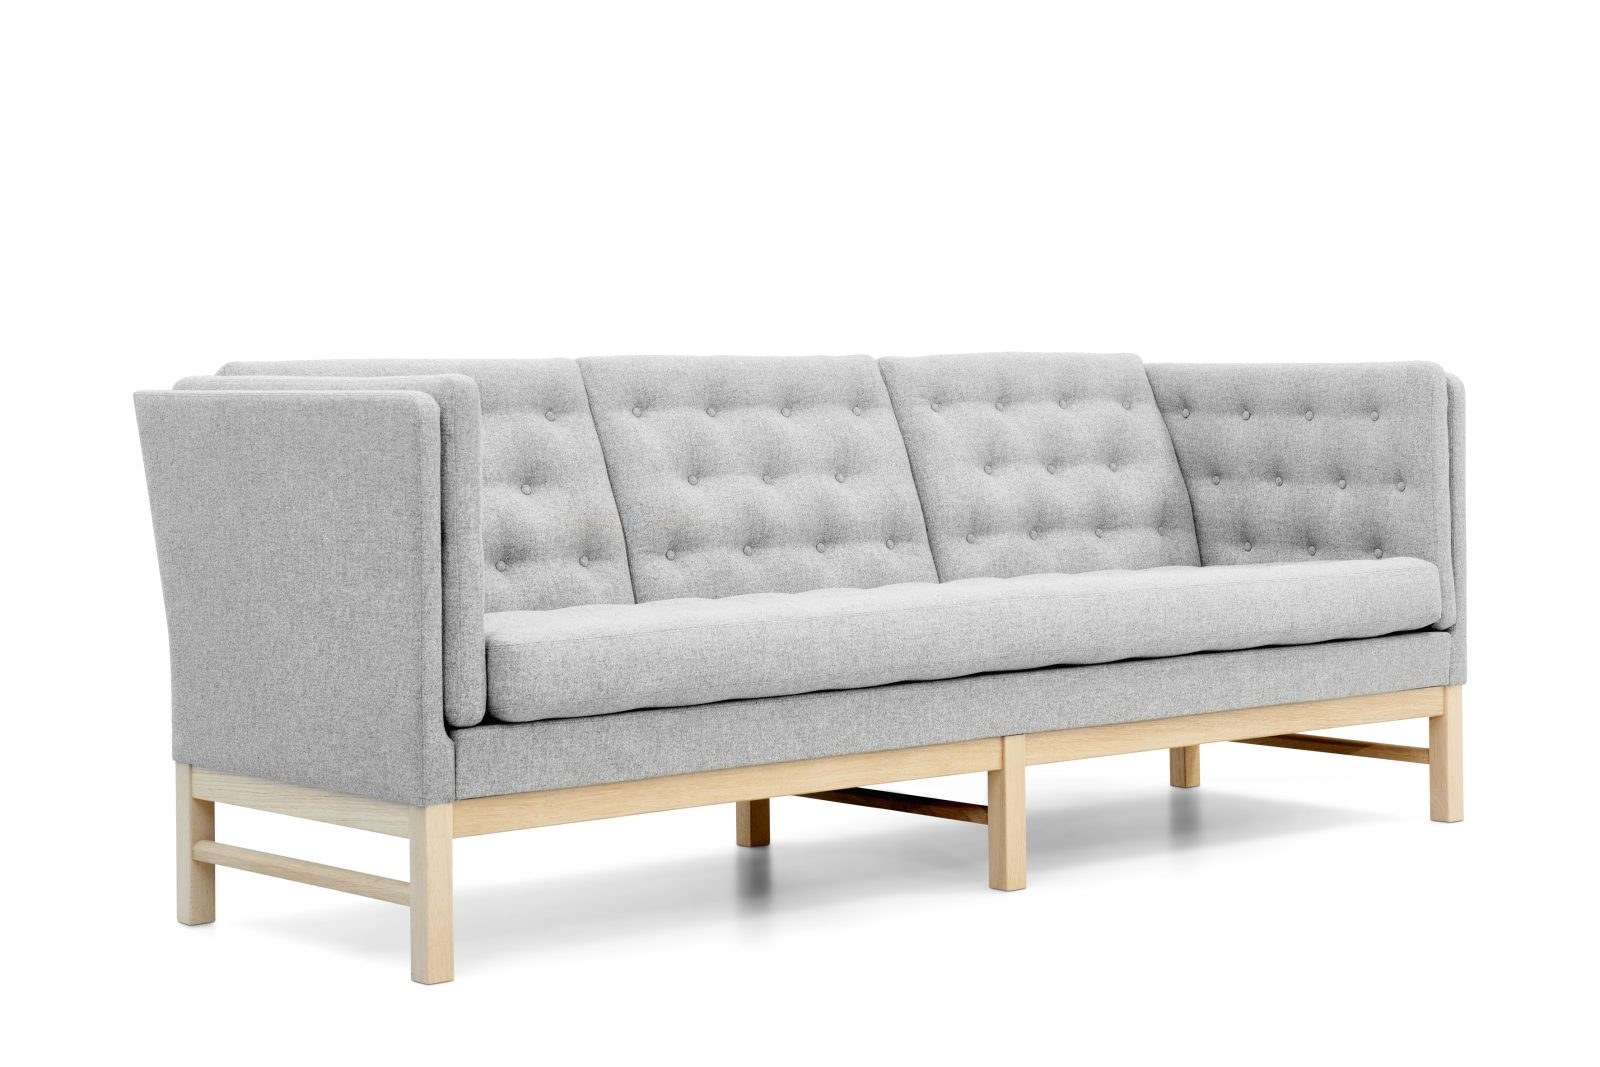 erik j rgensen ej 315 sofa und sessel nordic urban gmbh. Black Bedroom Furniture Sets. Home Design Ideas